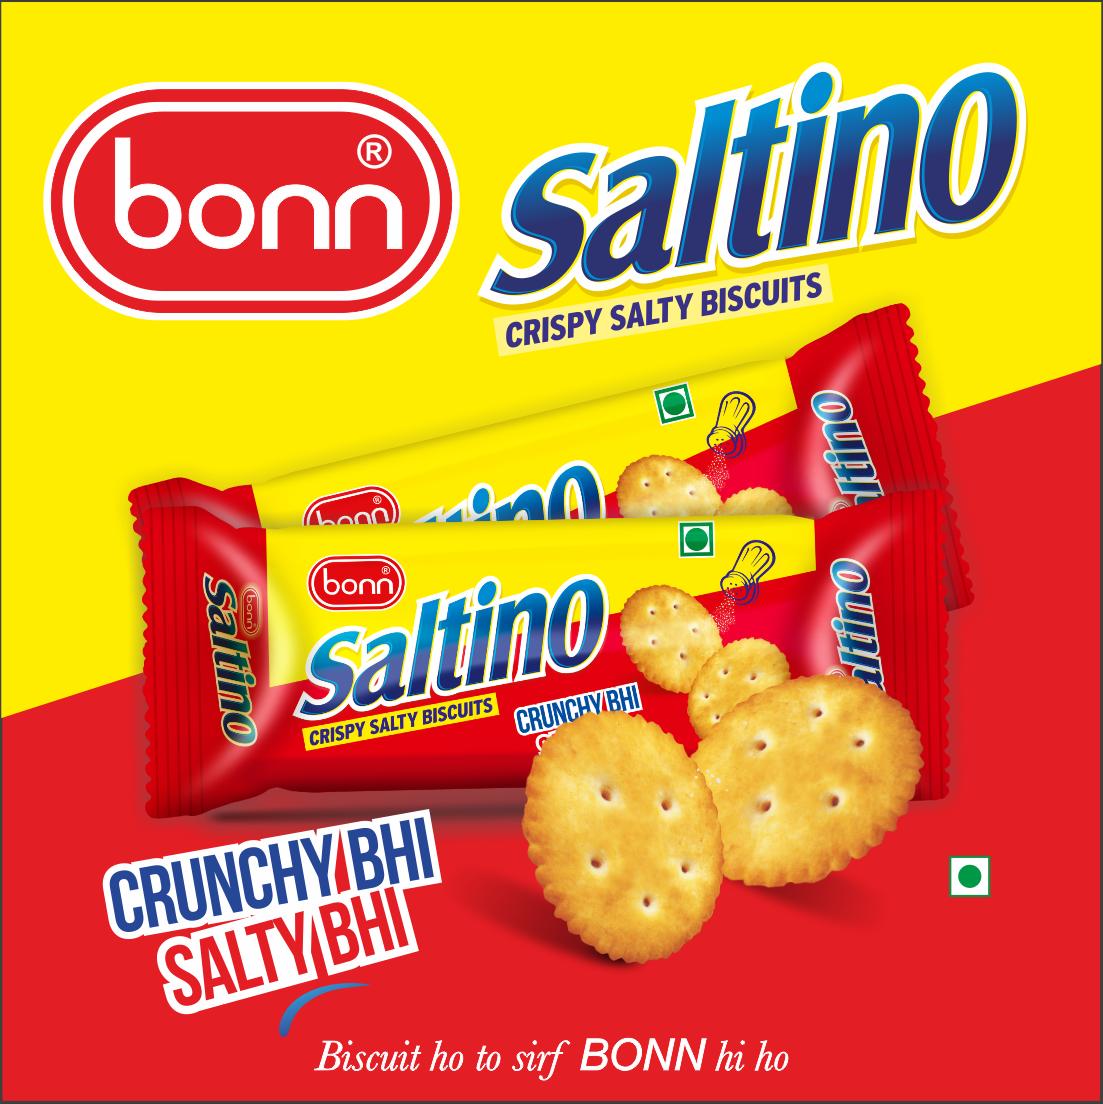 Bonn Saltino Biscuits